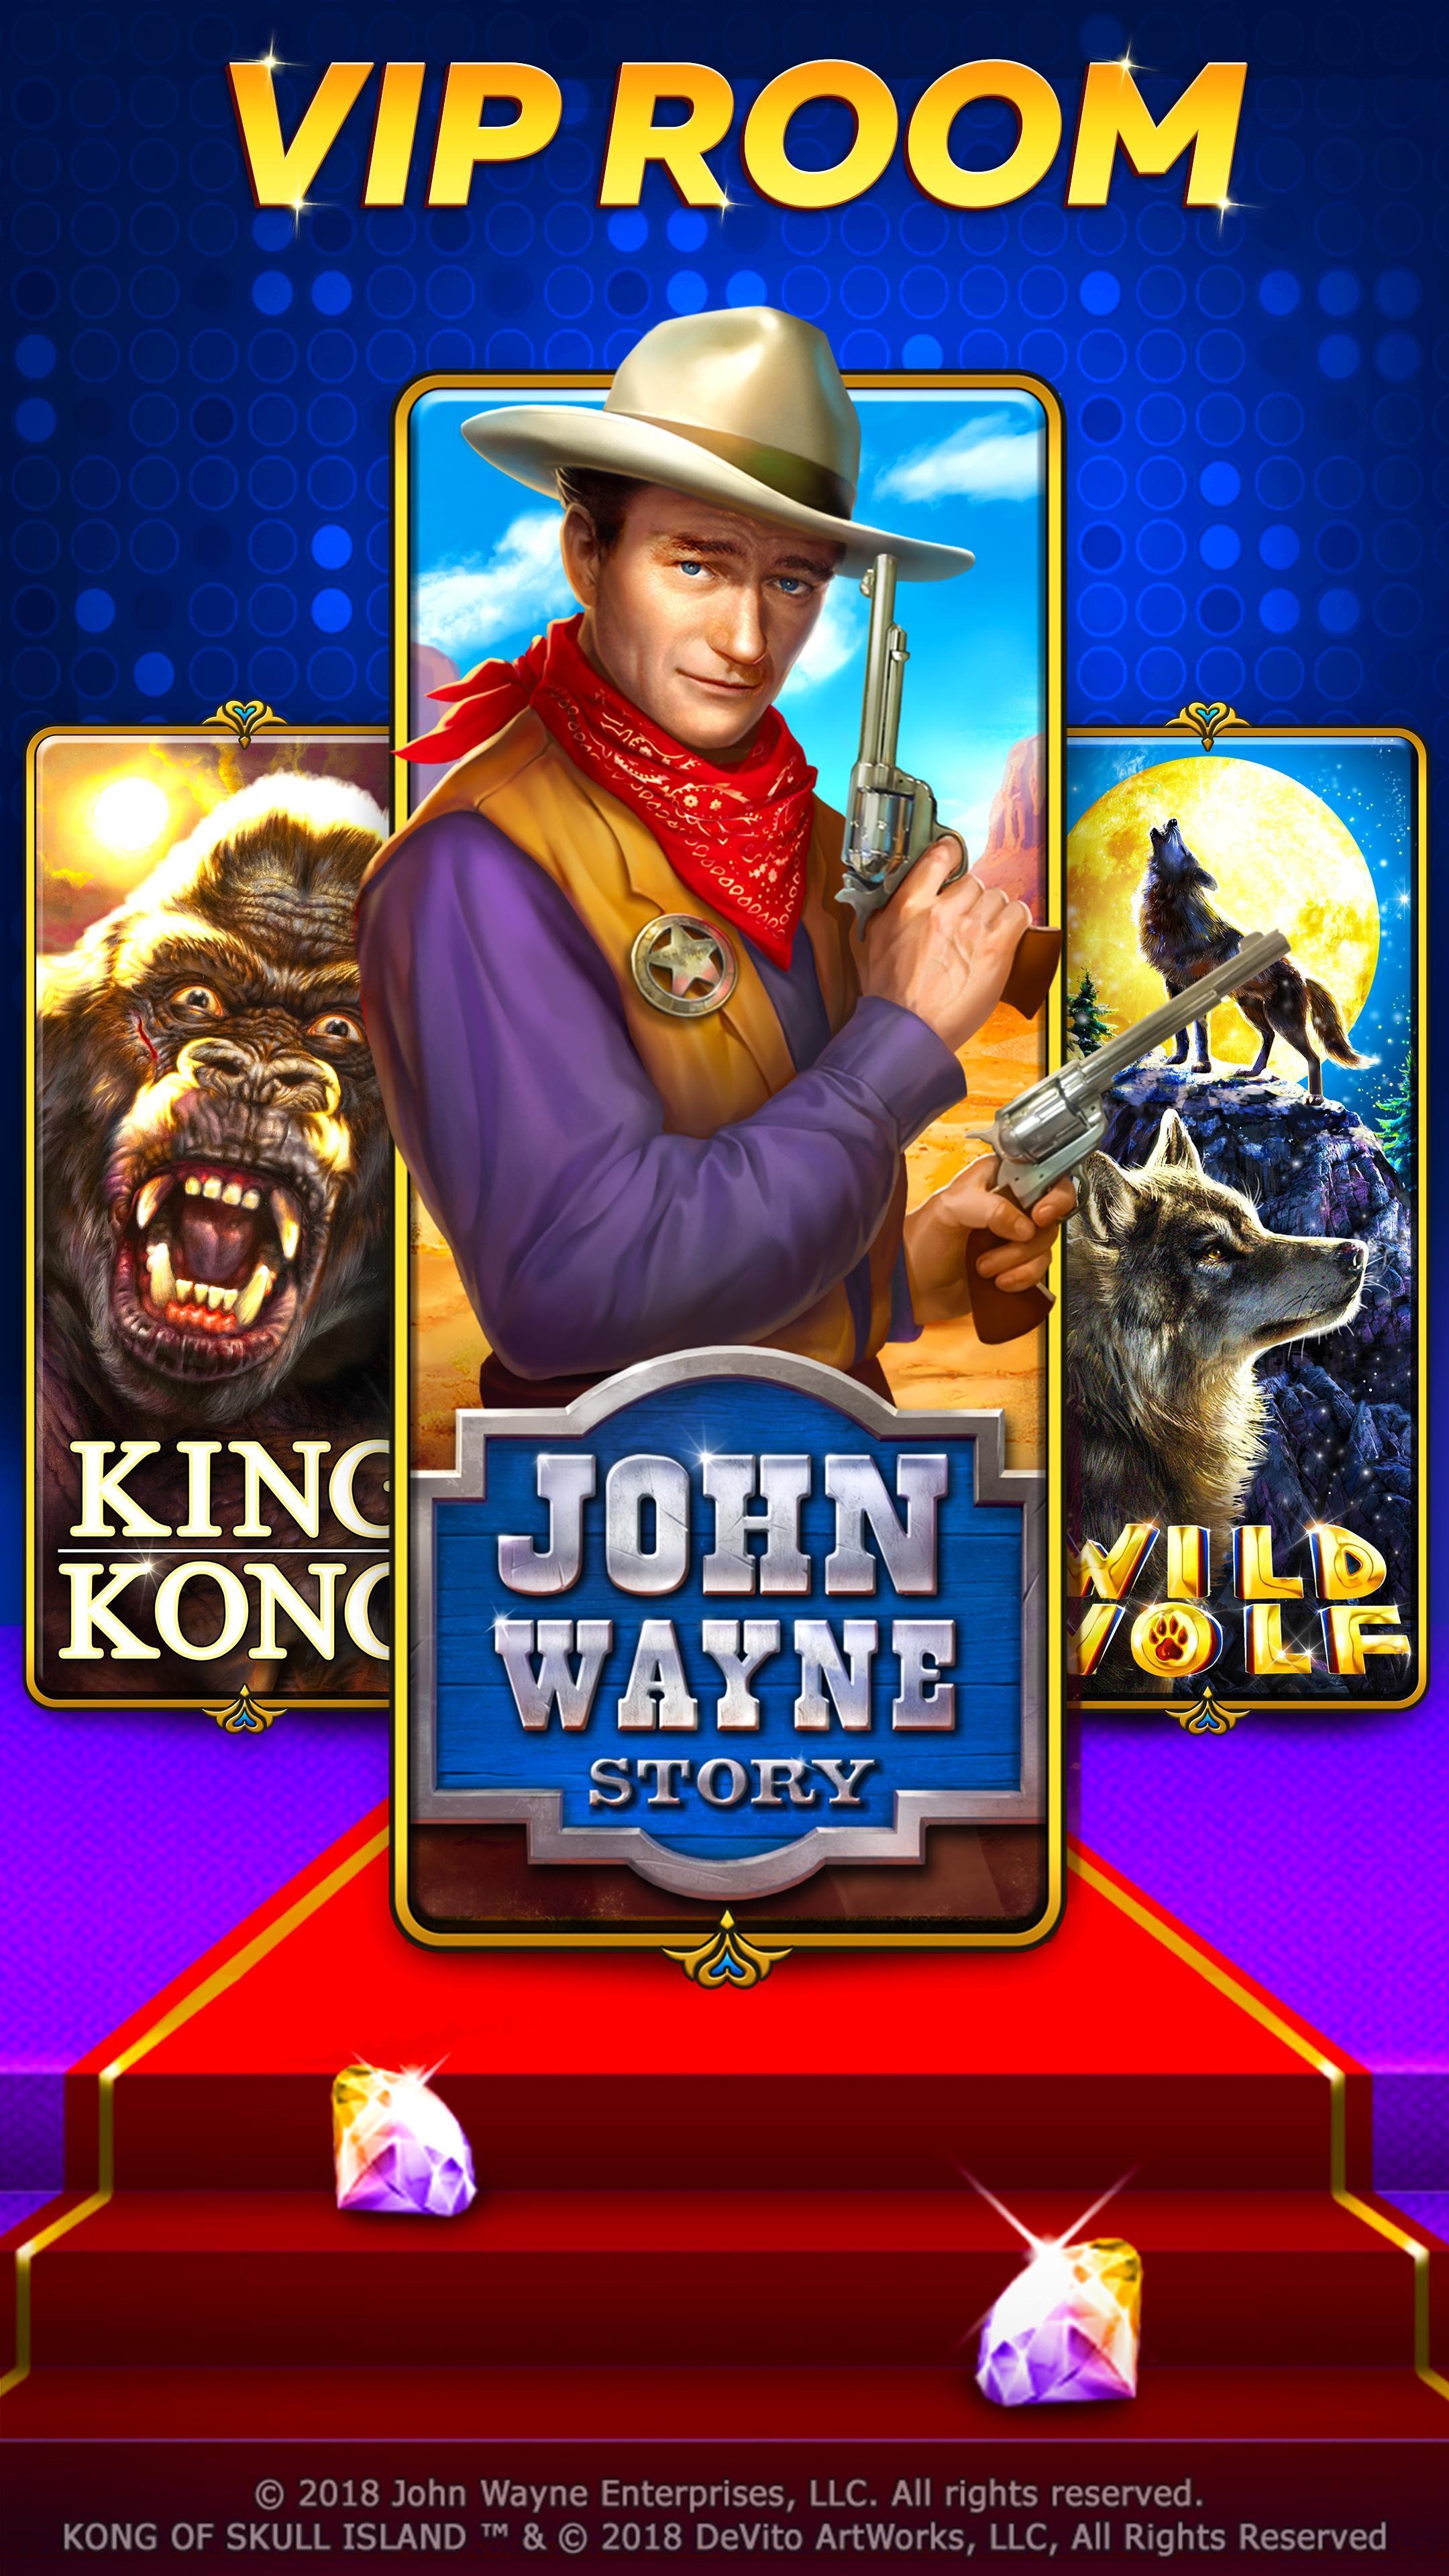 online casino usa no deposit bonus codes 2019